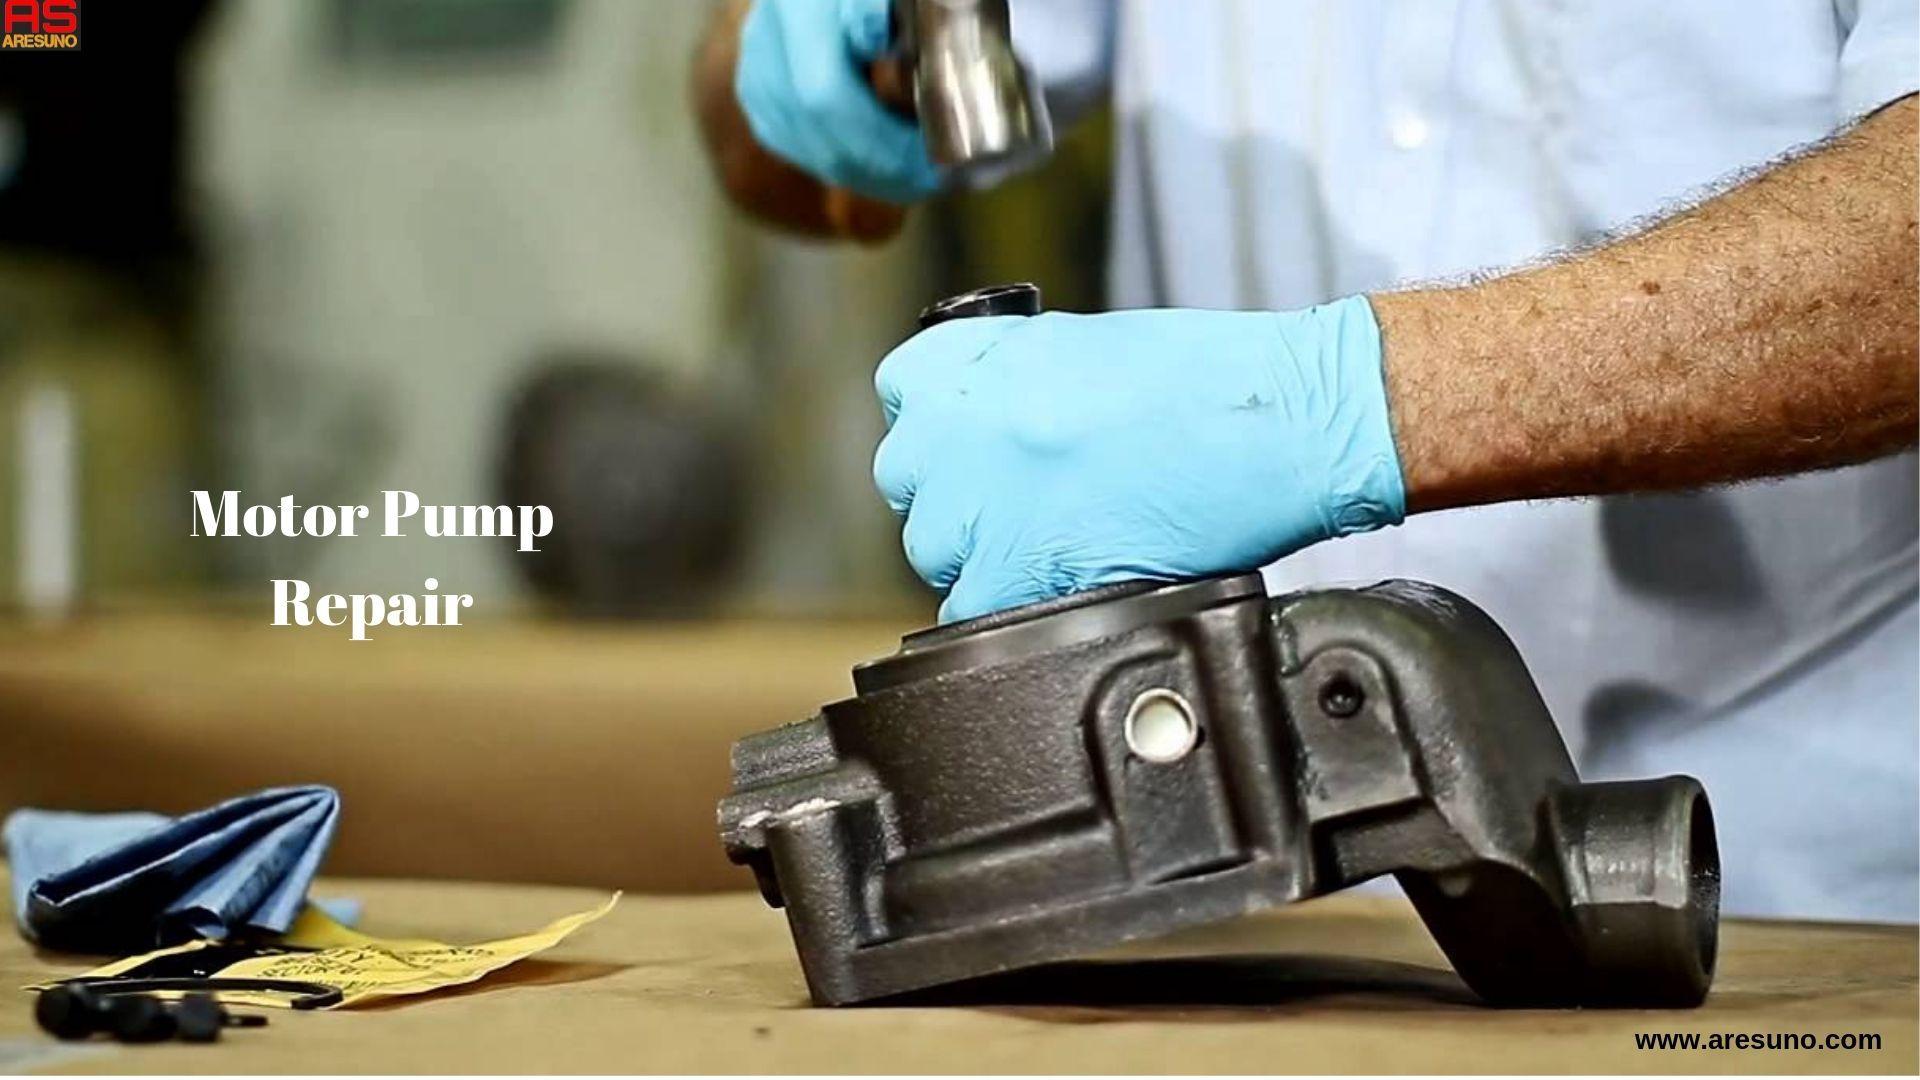 Water Motor Pump Repair Water Pump Motor Water Well Drilling Water Pumps